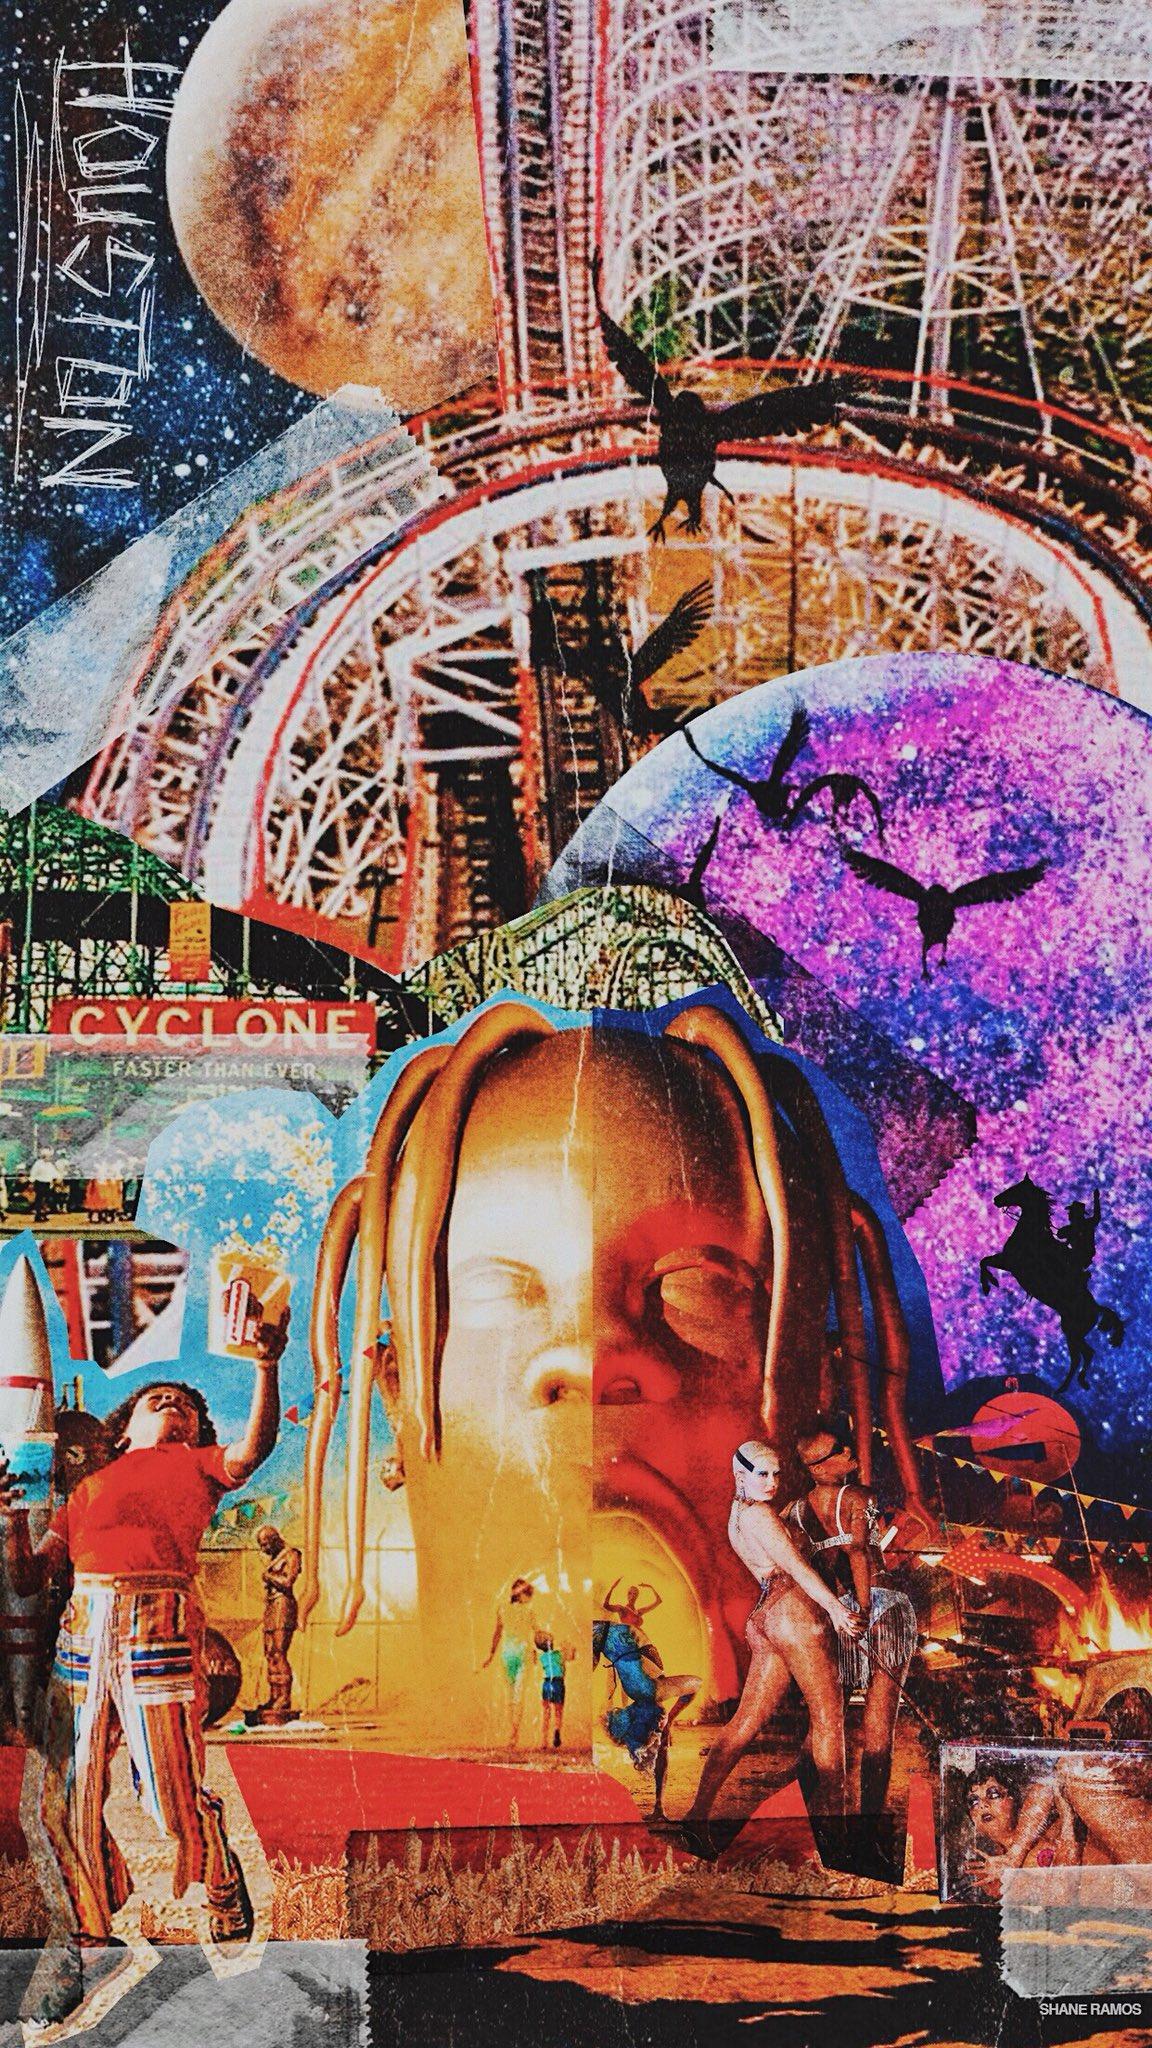 Astroworld Wallpaper Iphone 11